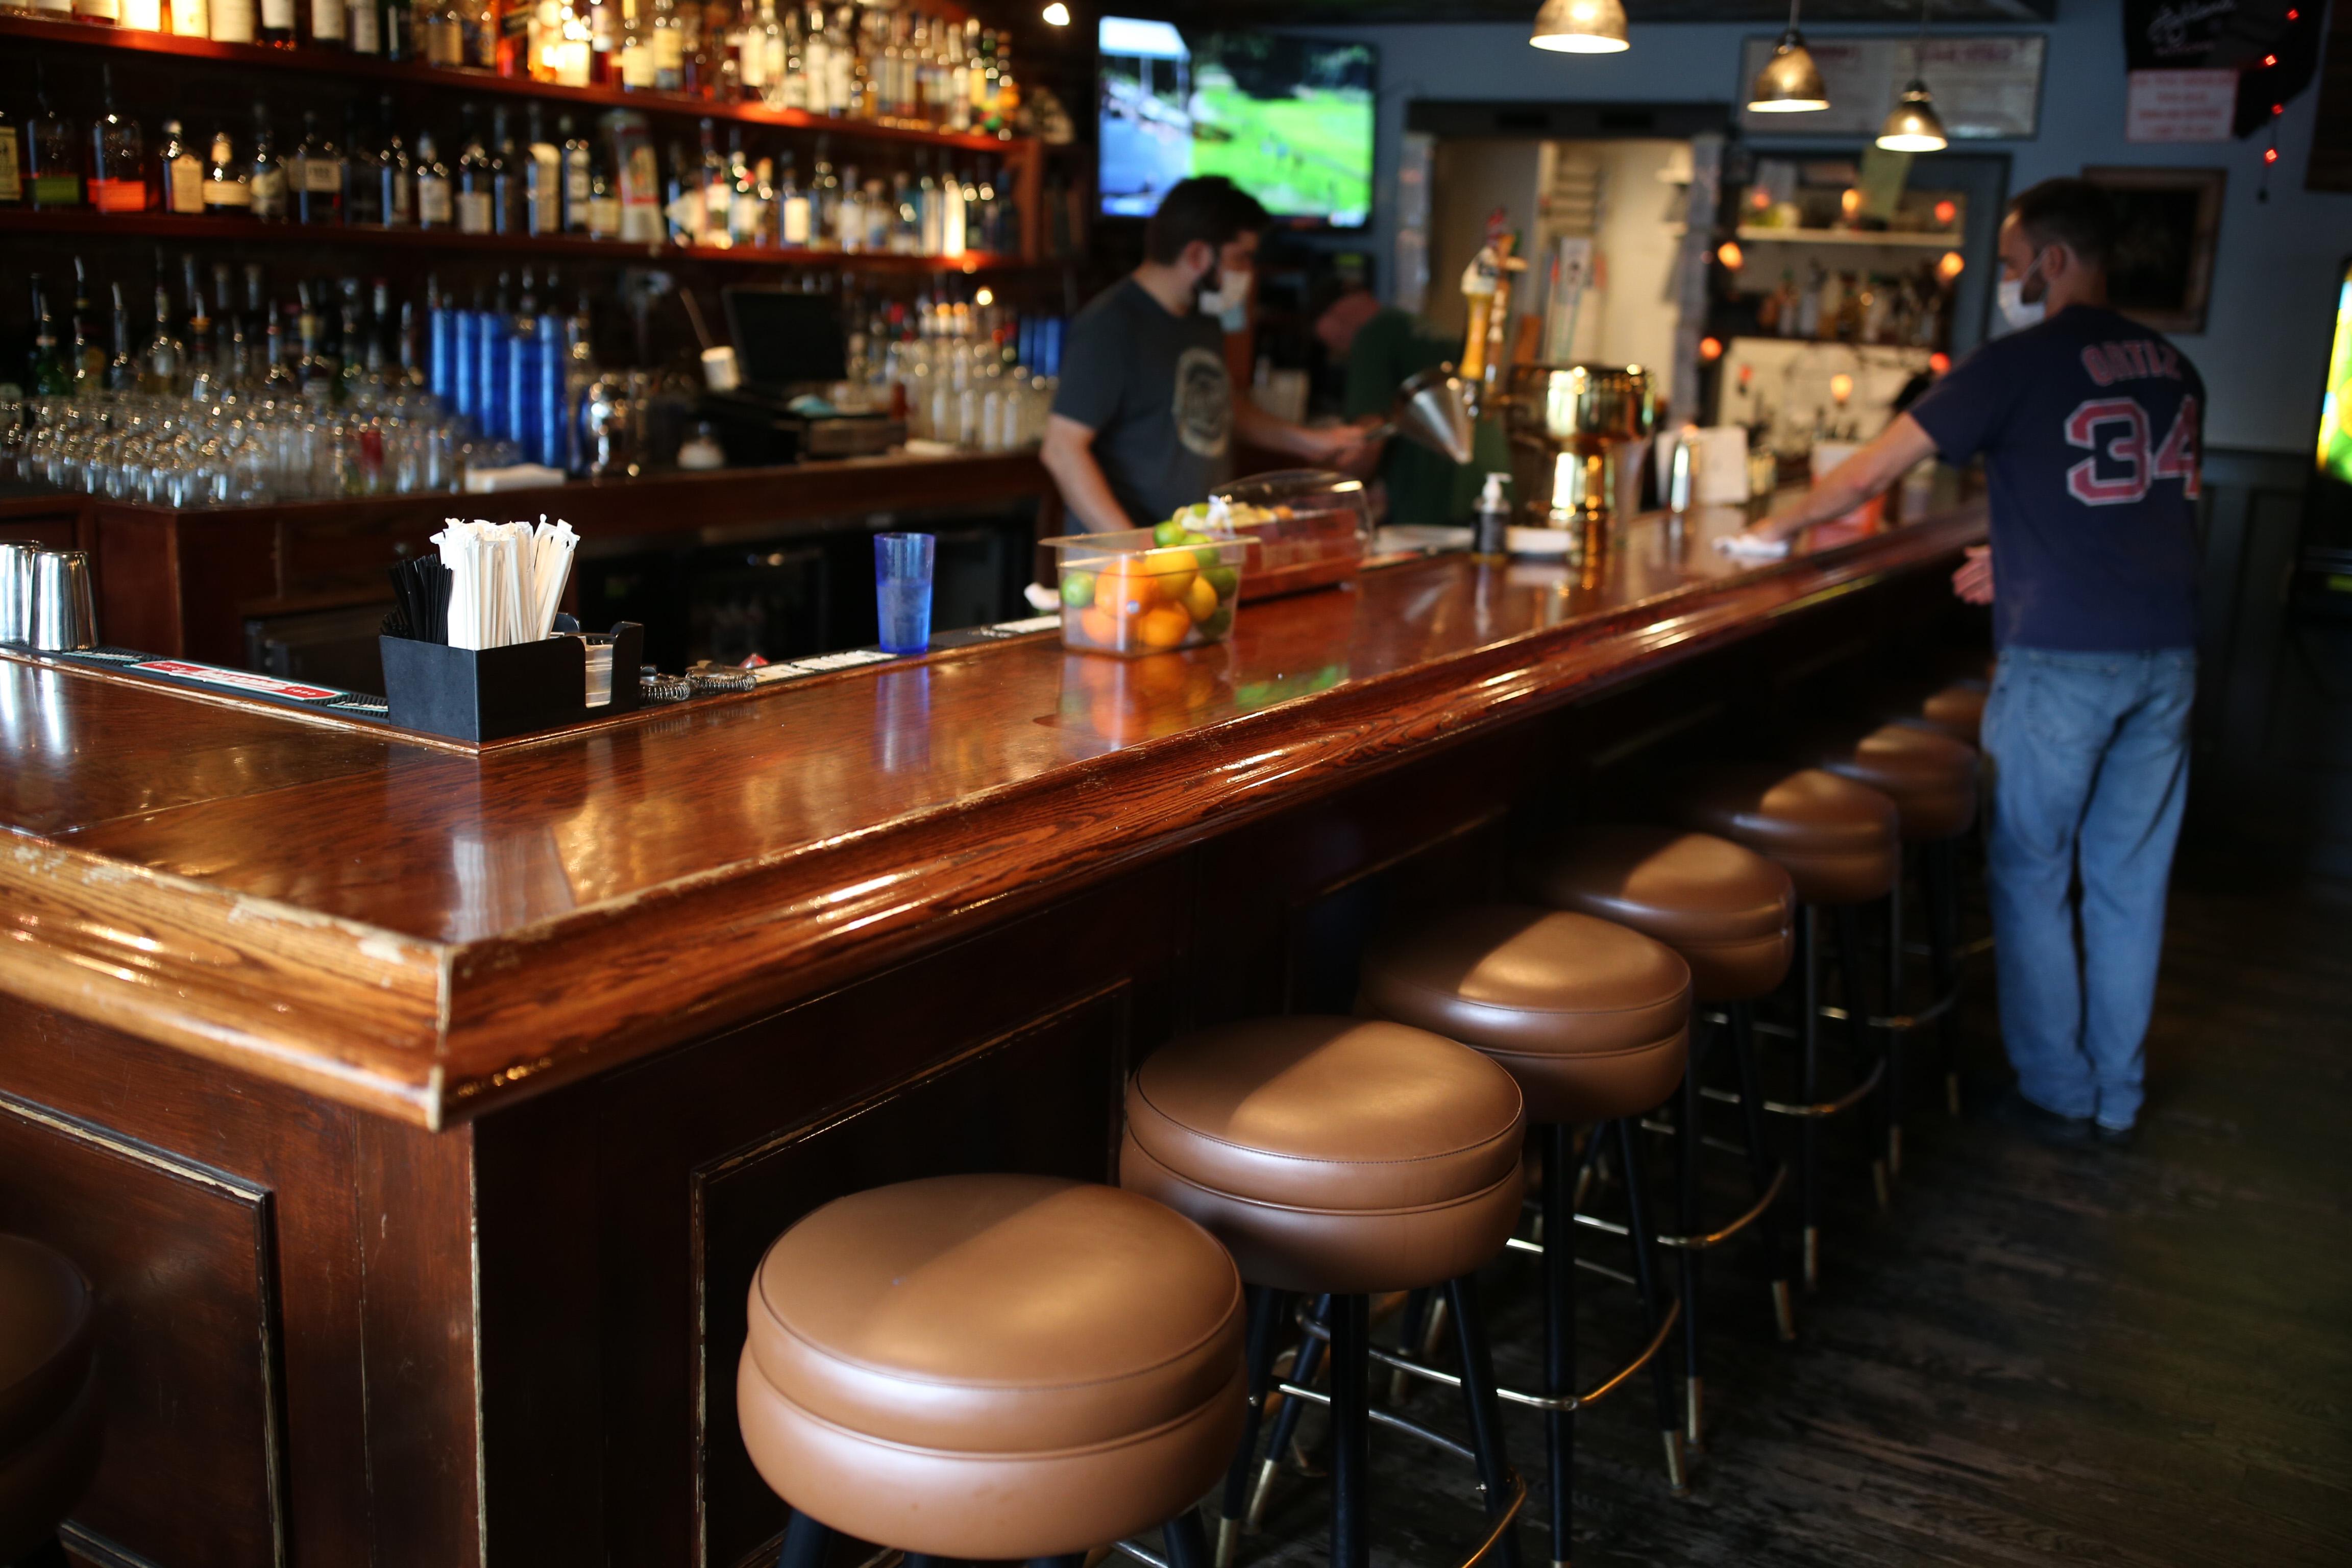 The bar at Highland Kitchen in Somerville.